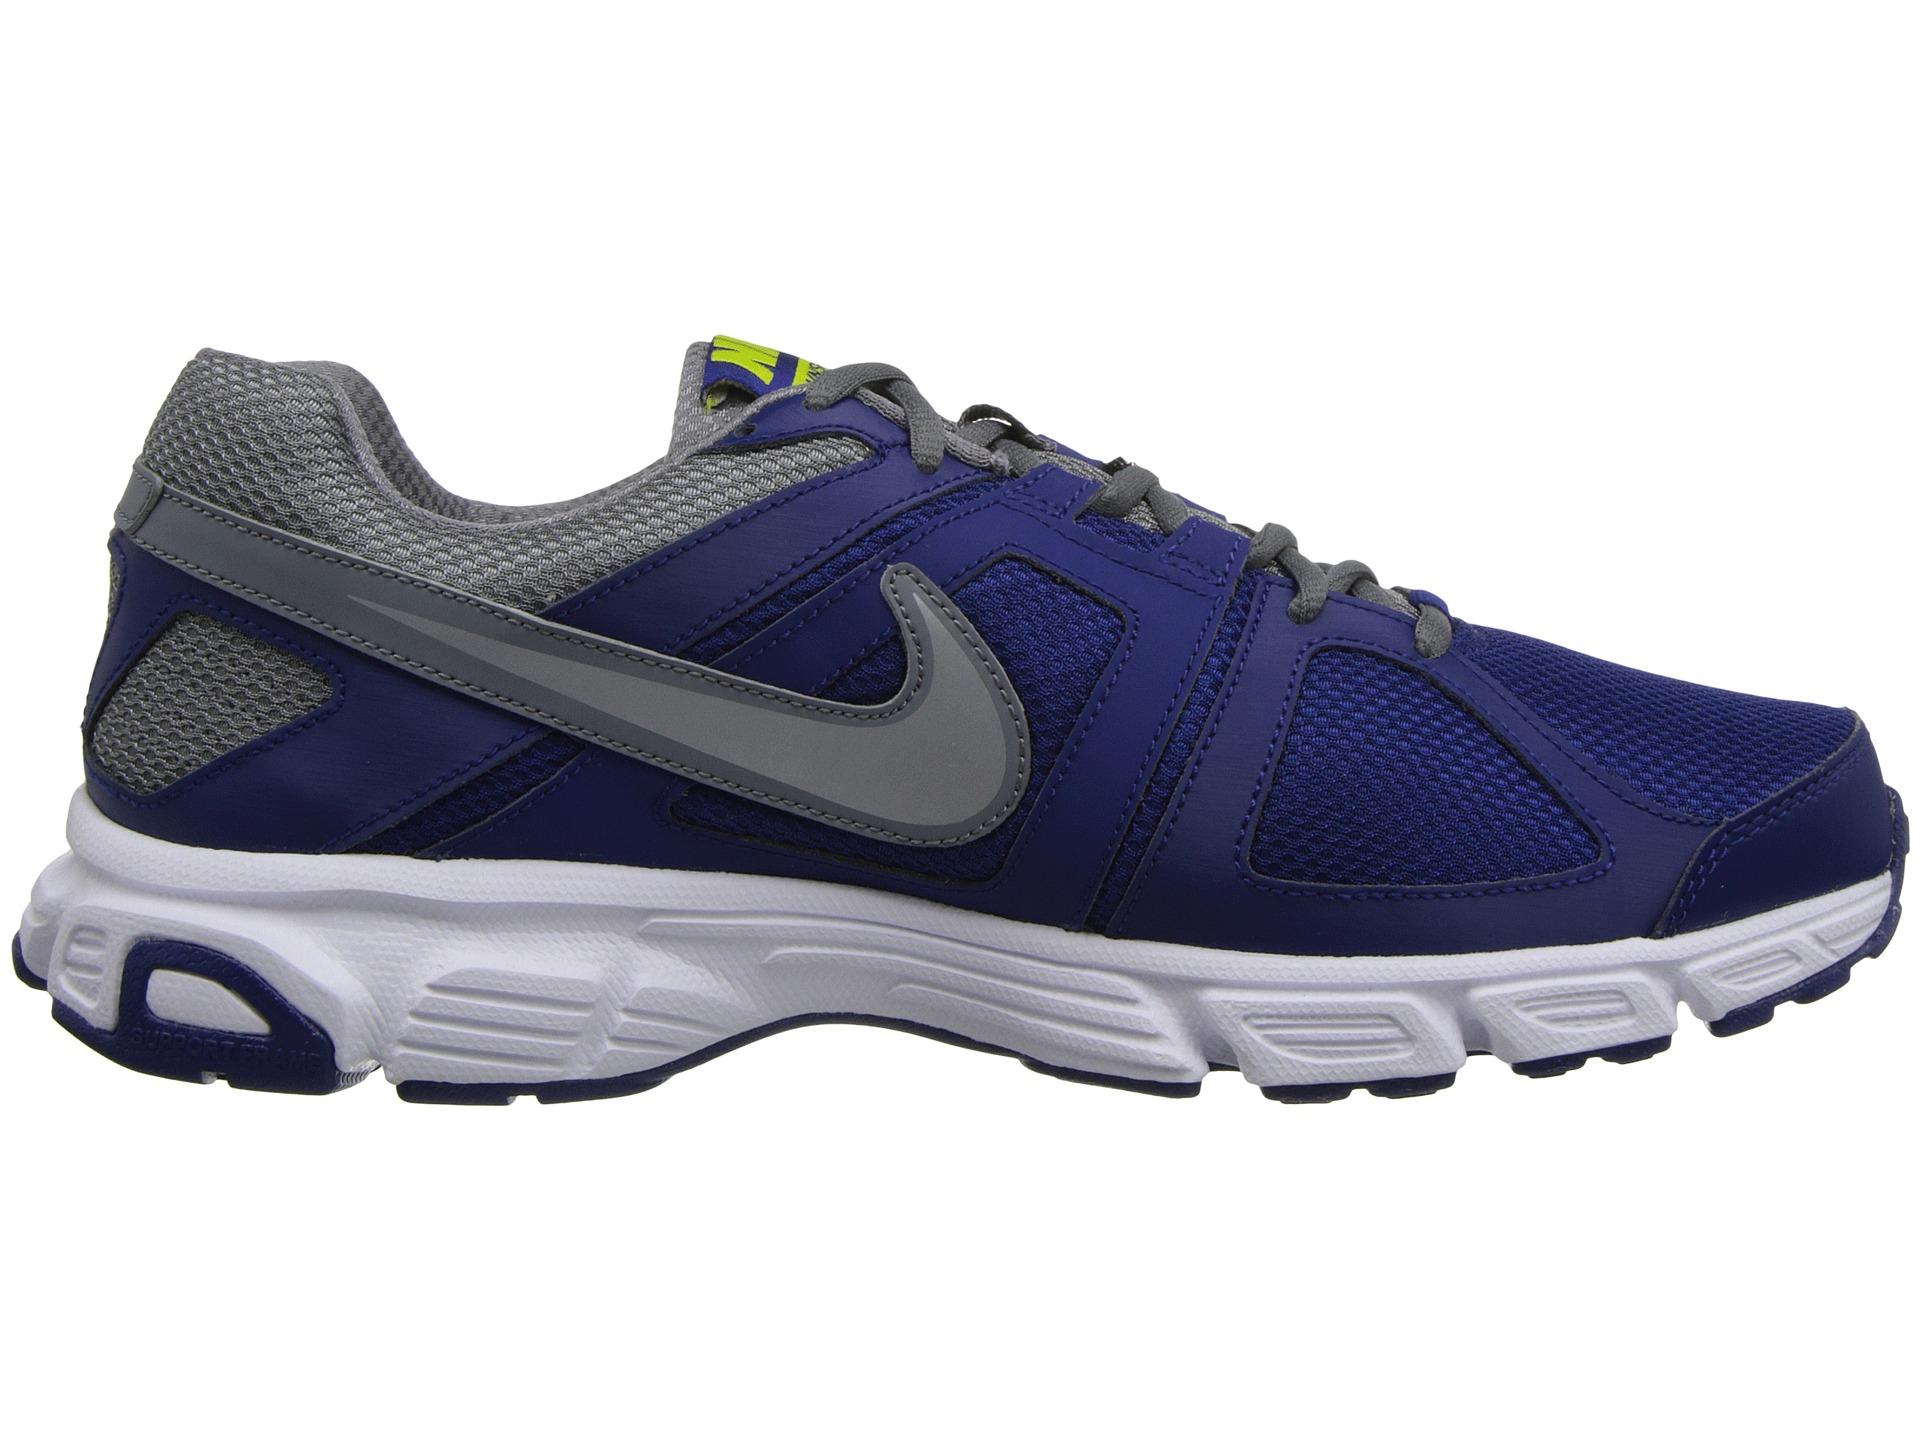 Lyst - Nike Downshifter 5 in Blue for Men c76953b227df